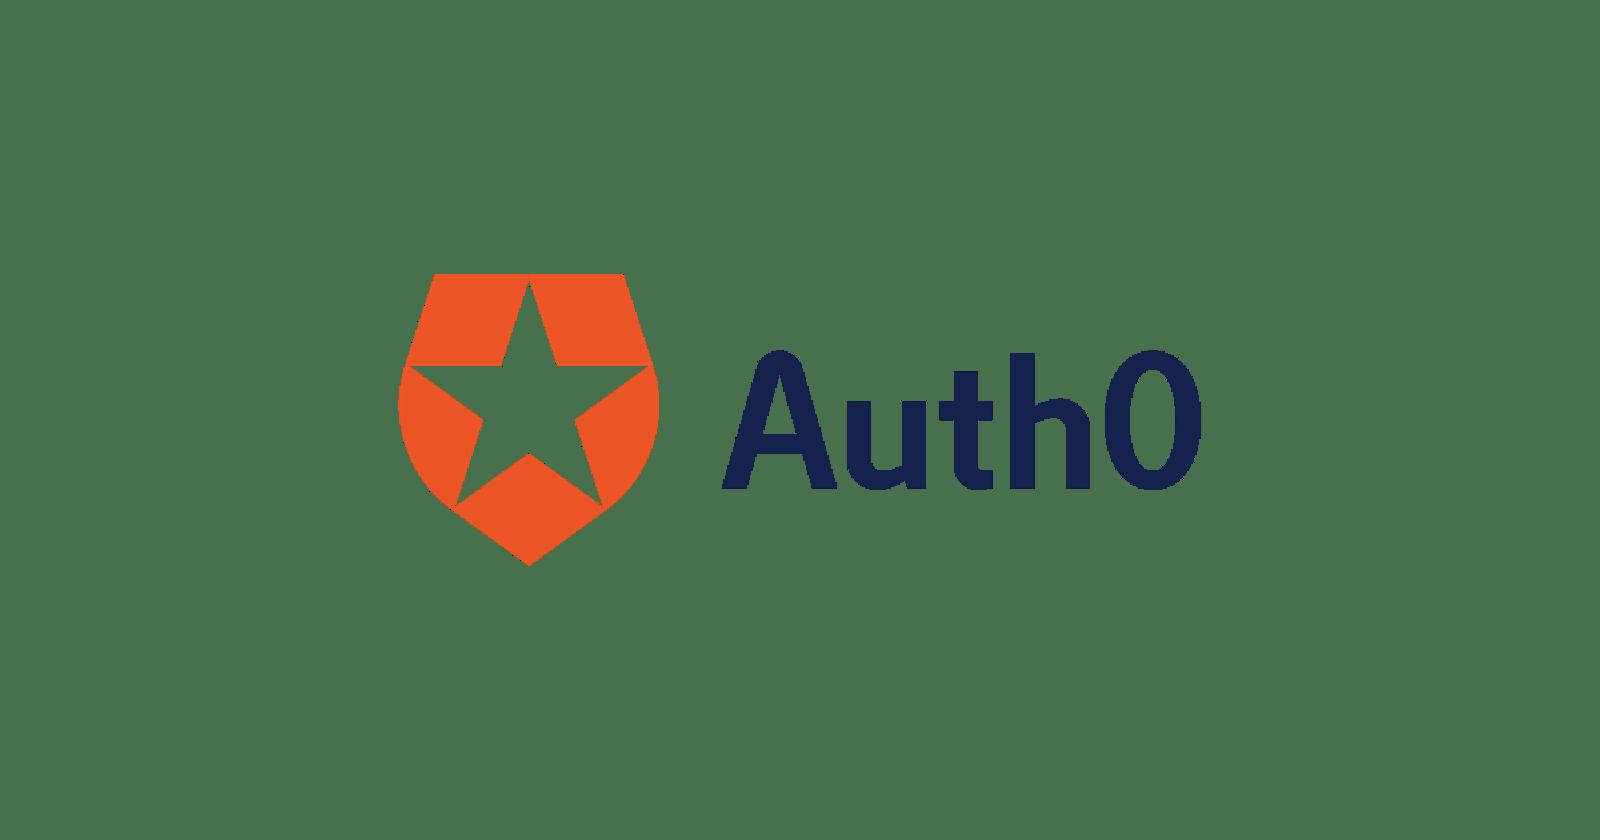 Fetching Auth0 Metadata